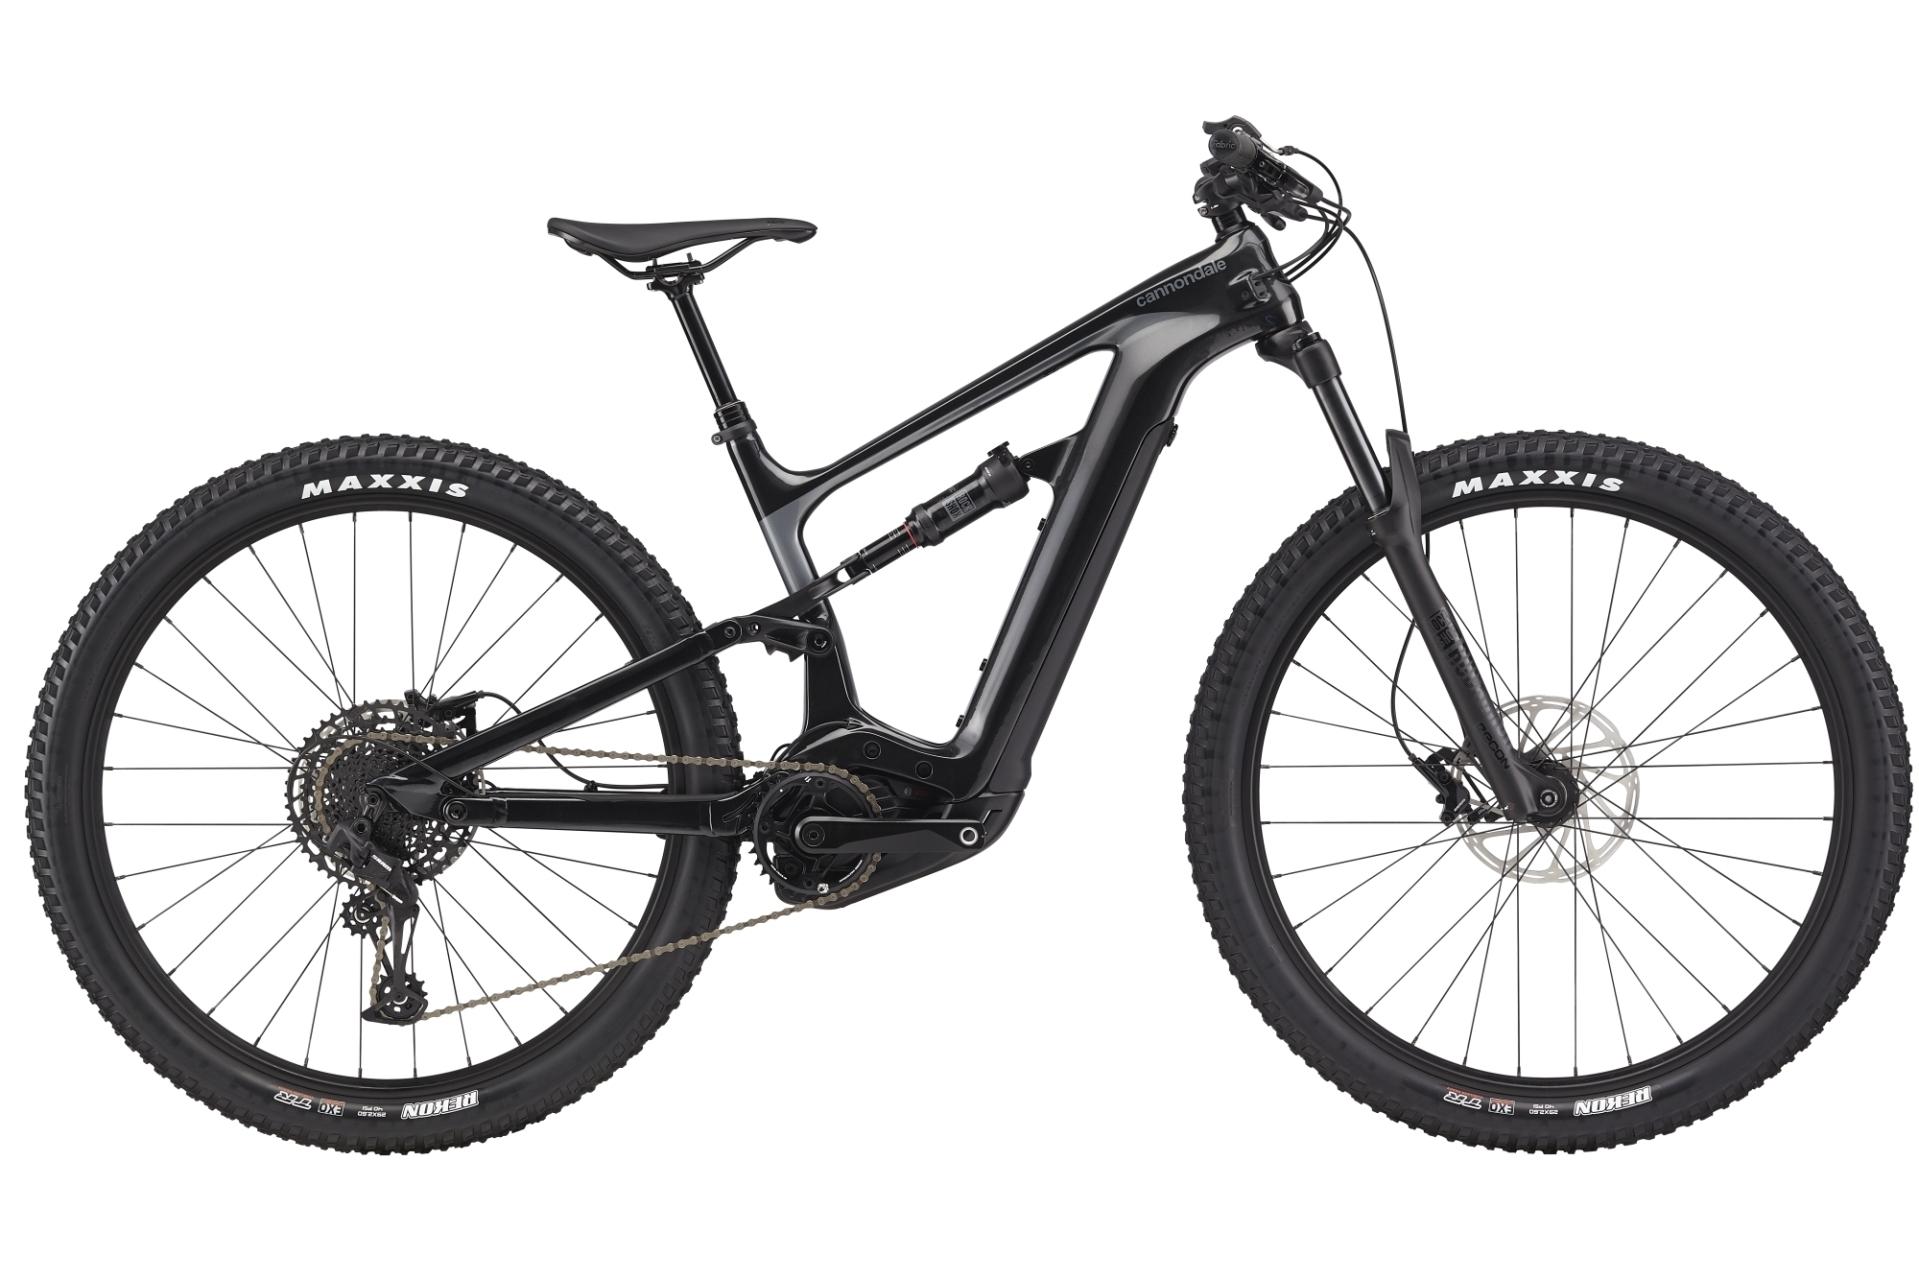 Cannondale Habit Neo 4 Trail pedelec kerékpár - fekete - XL (2020)